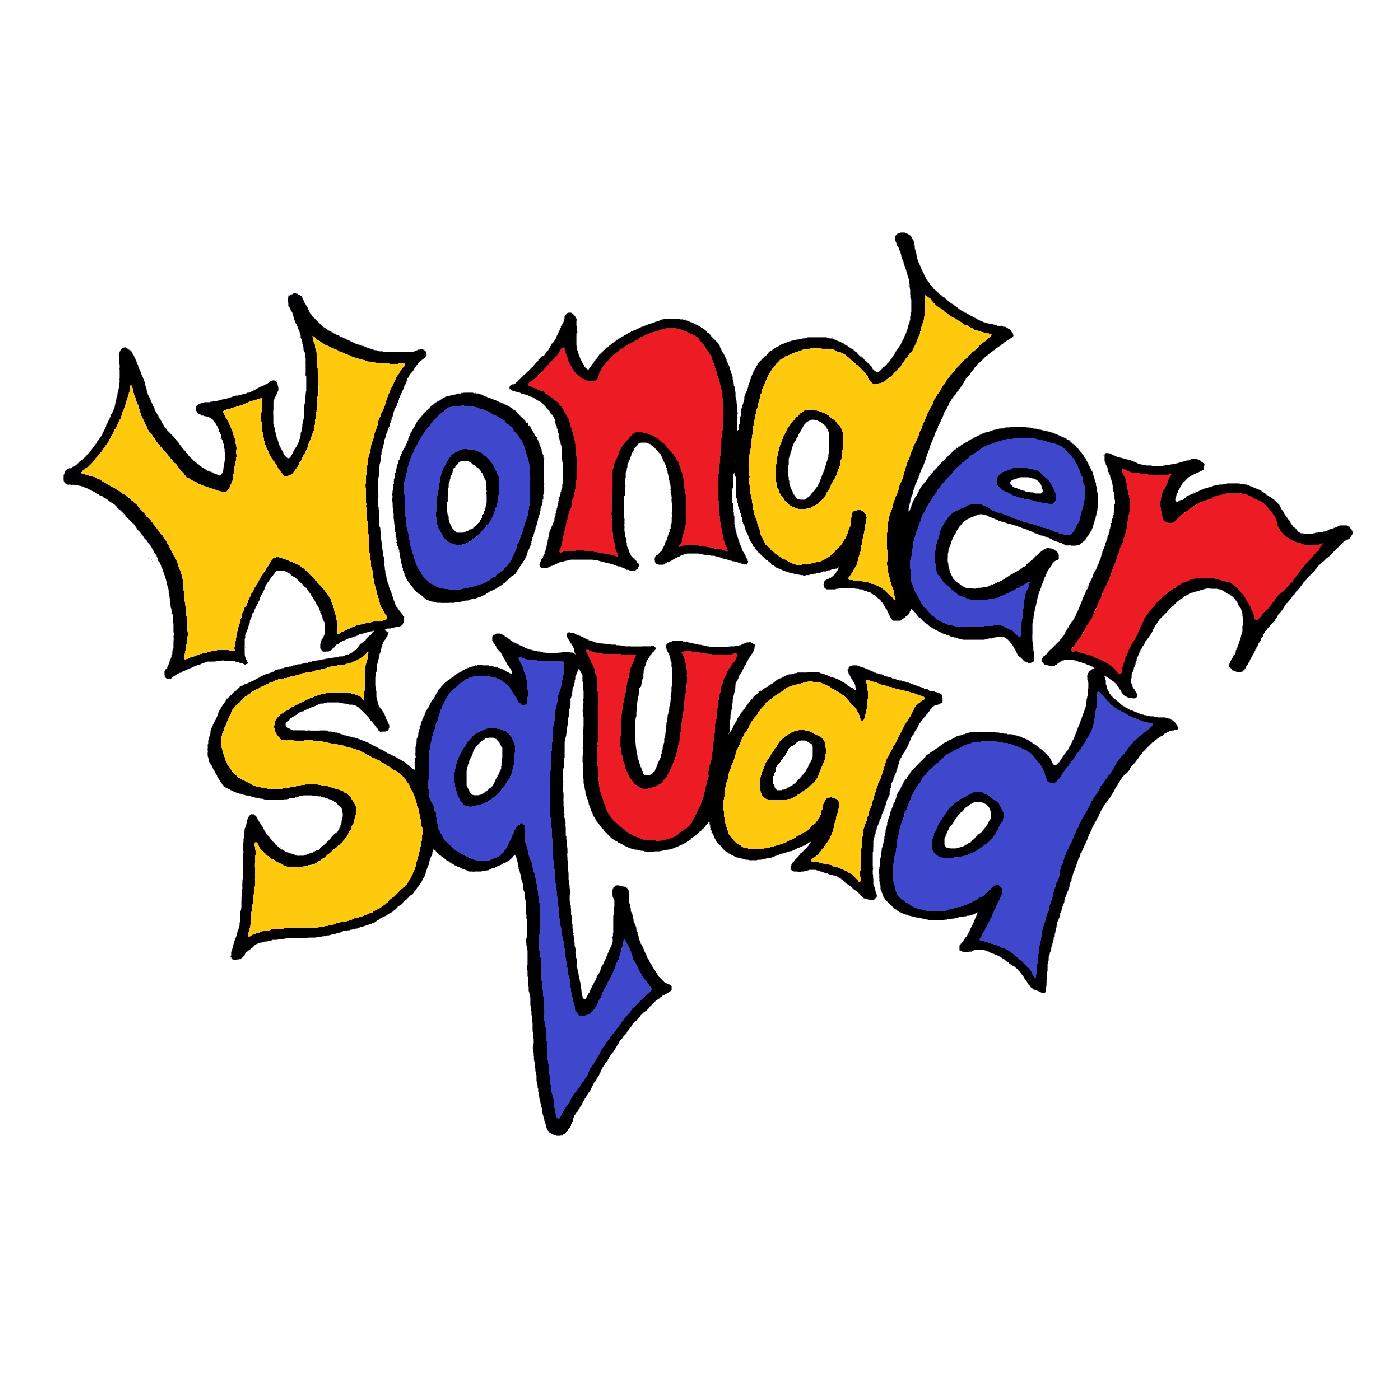 Wonder Squad